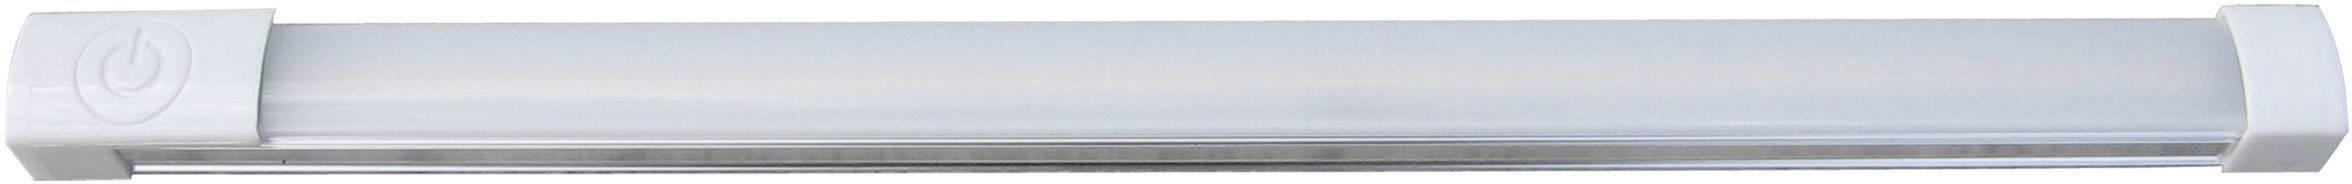 LED světelná lišta (základní sada) DioDor DIO-TL25-SP-FW, 3.5 W, 25 cm, studená bílá, bílá